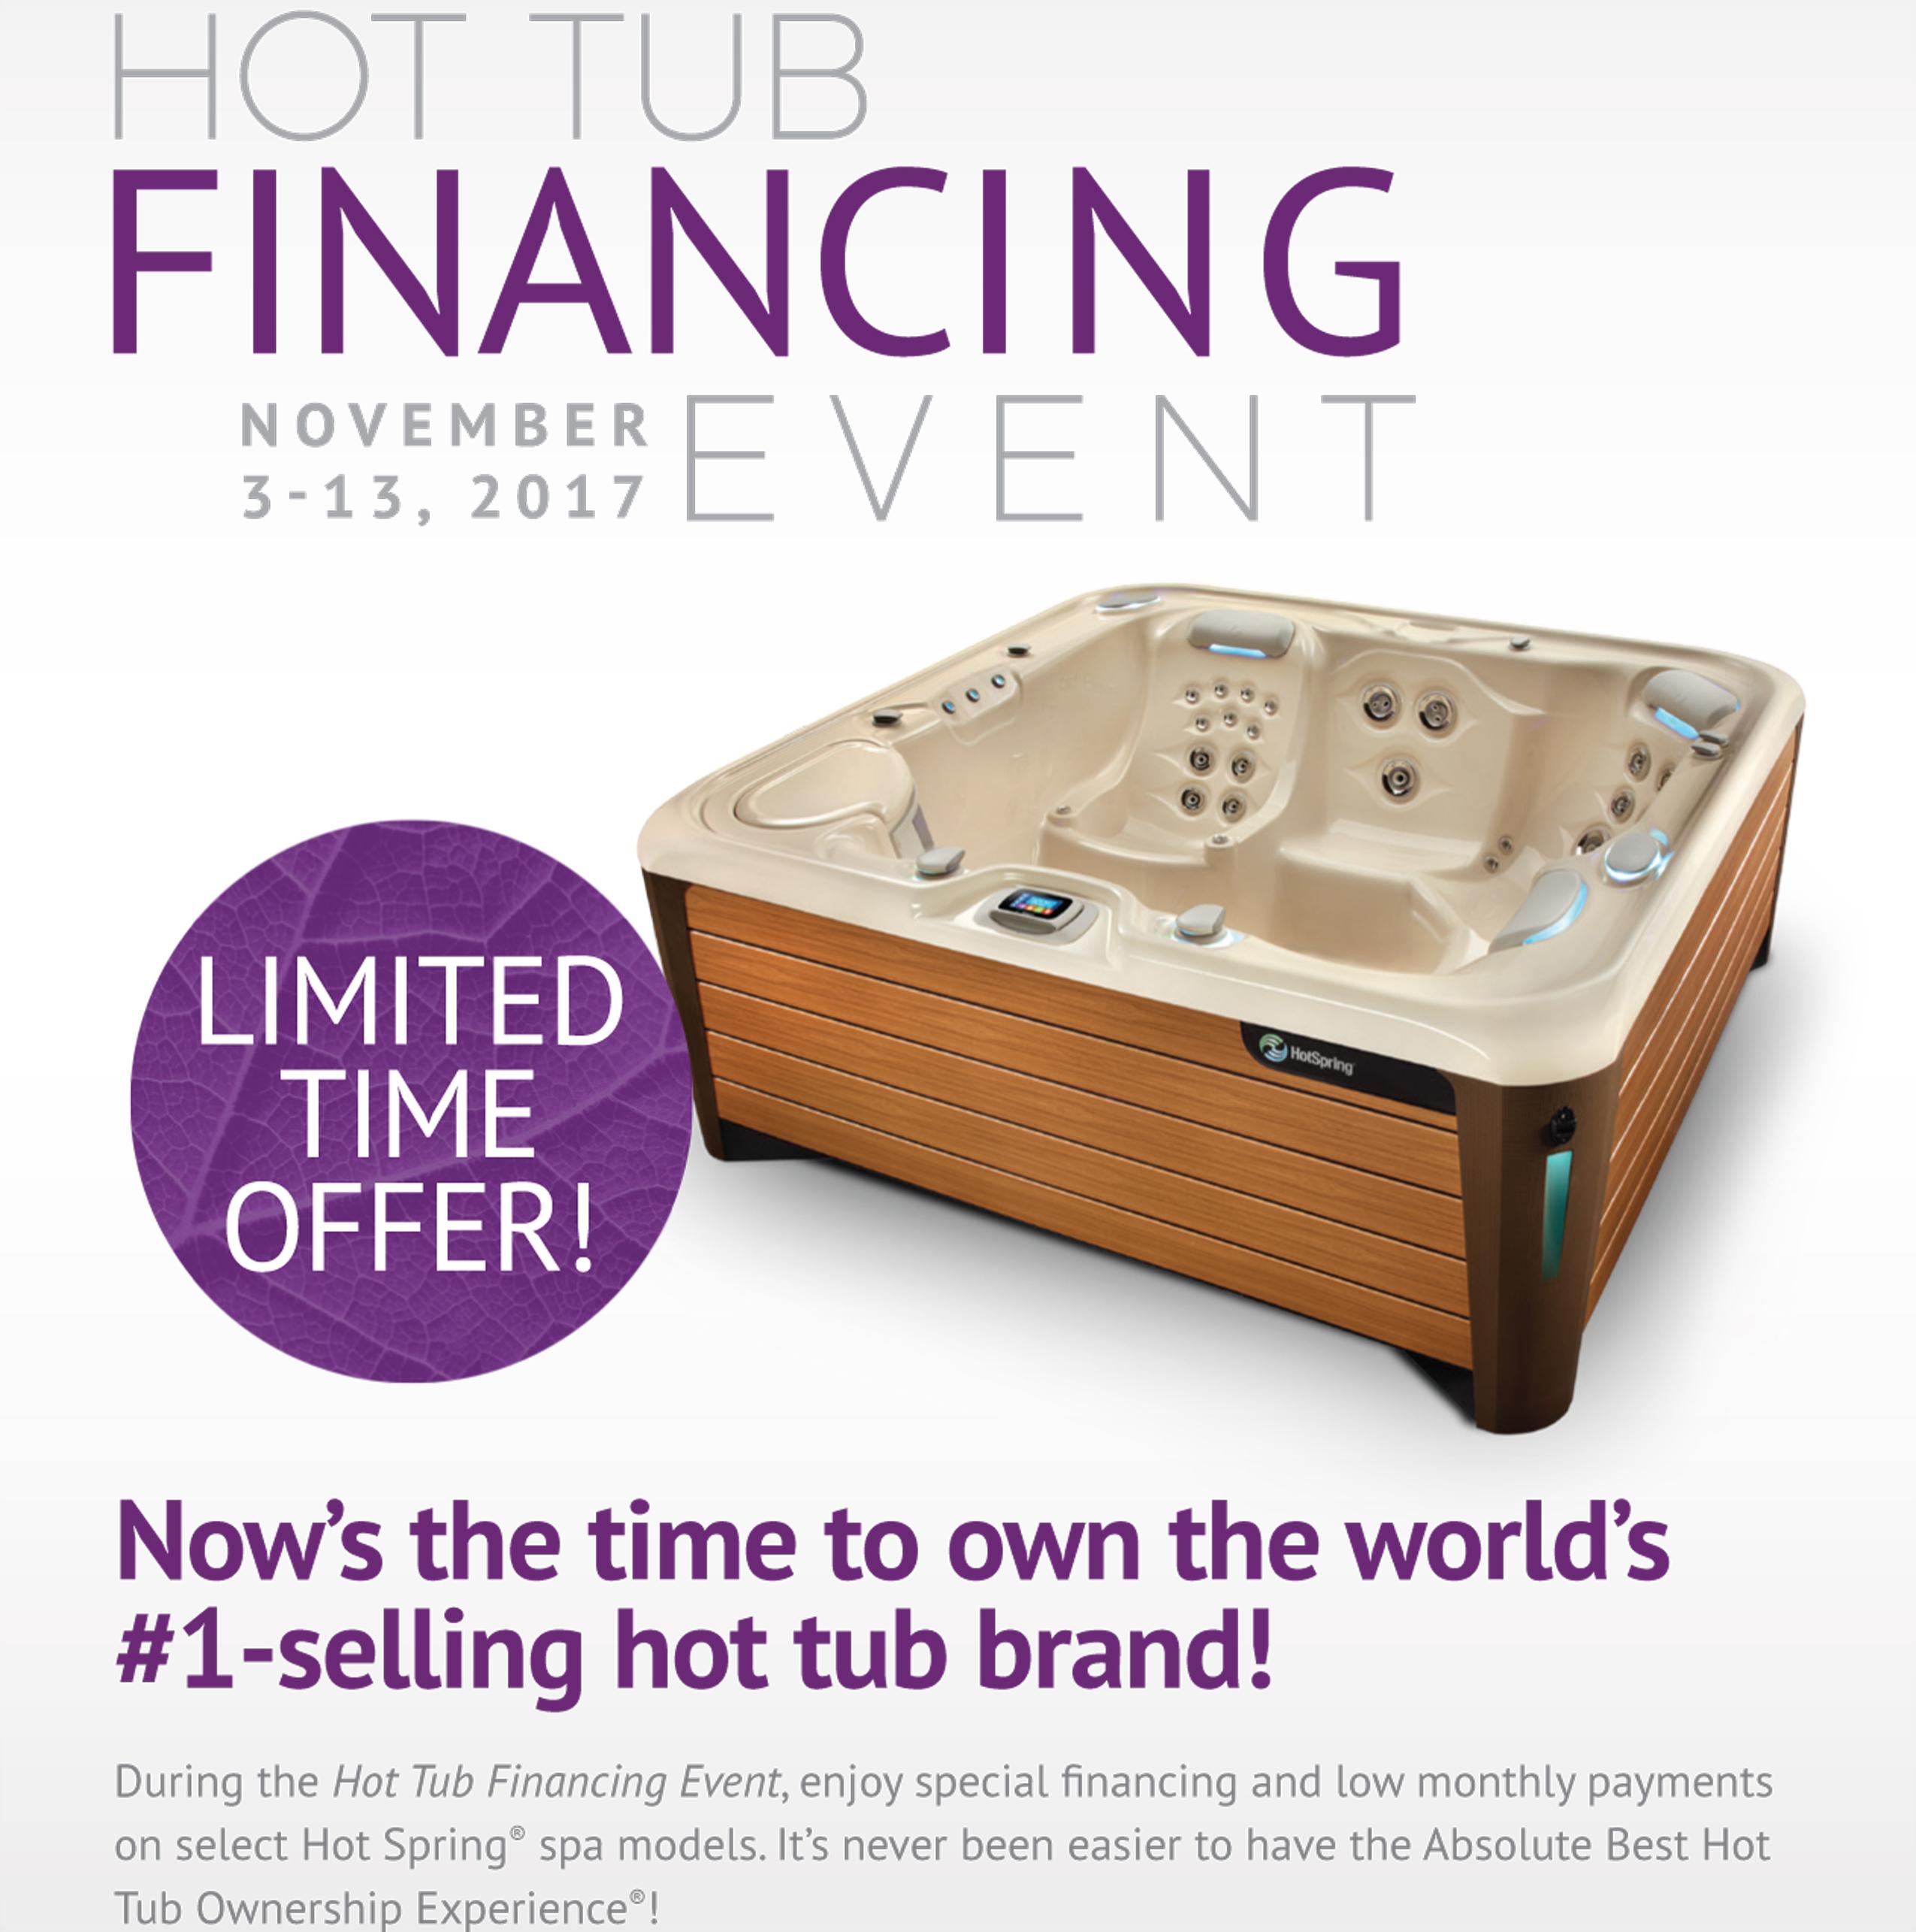 Hot Tub Financing Event